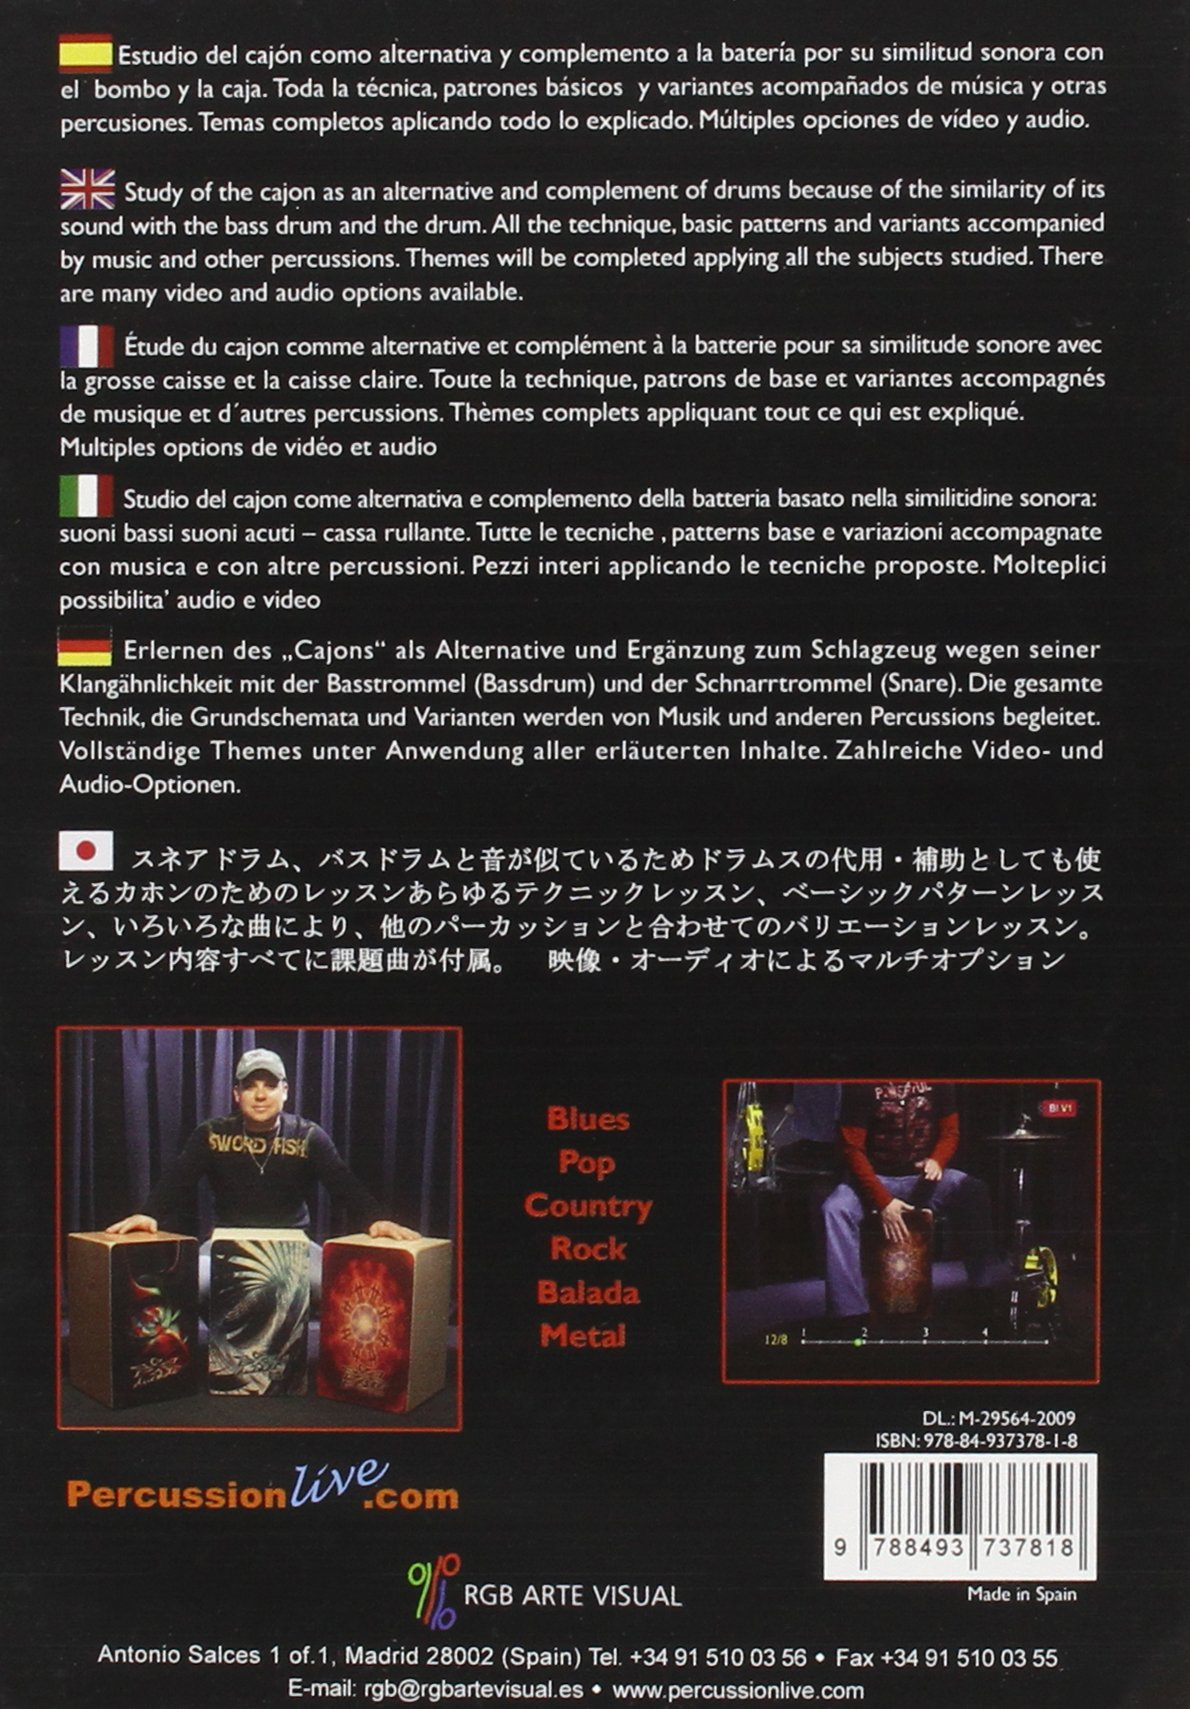 Cajon Method and Other Percussions - Rock: Rhythm Patterns Blues, Pop, Rock, Balada, Metal: Dany Moreno: 9788493737818: Amazon.com: Books